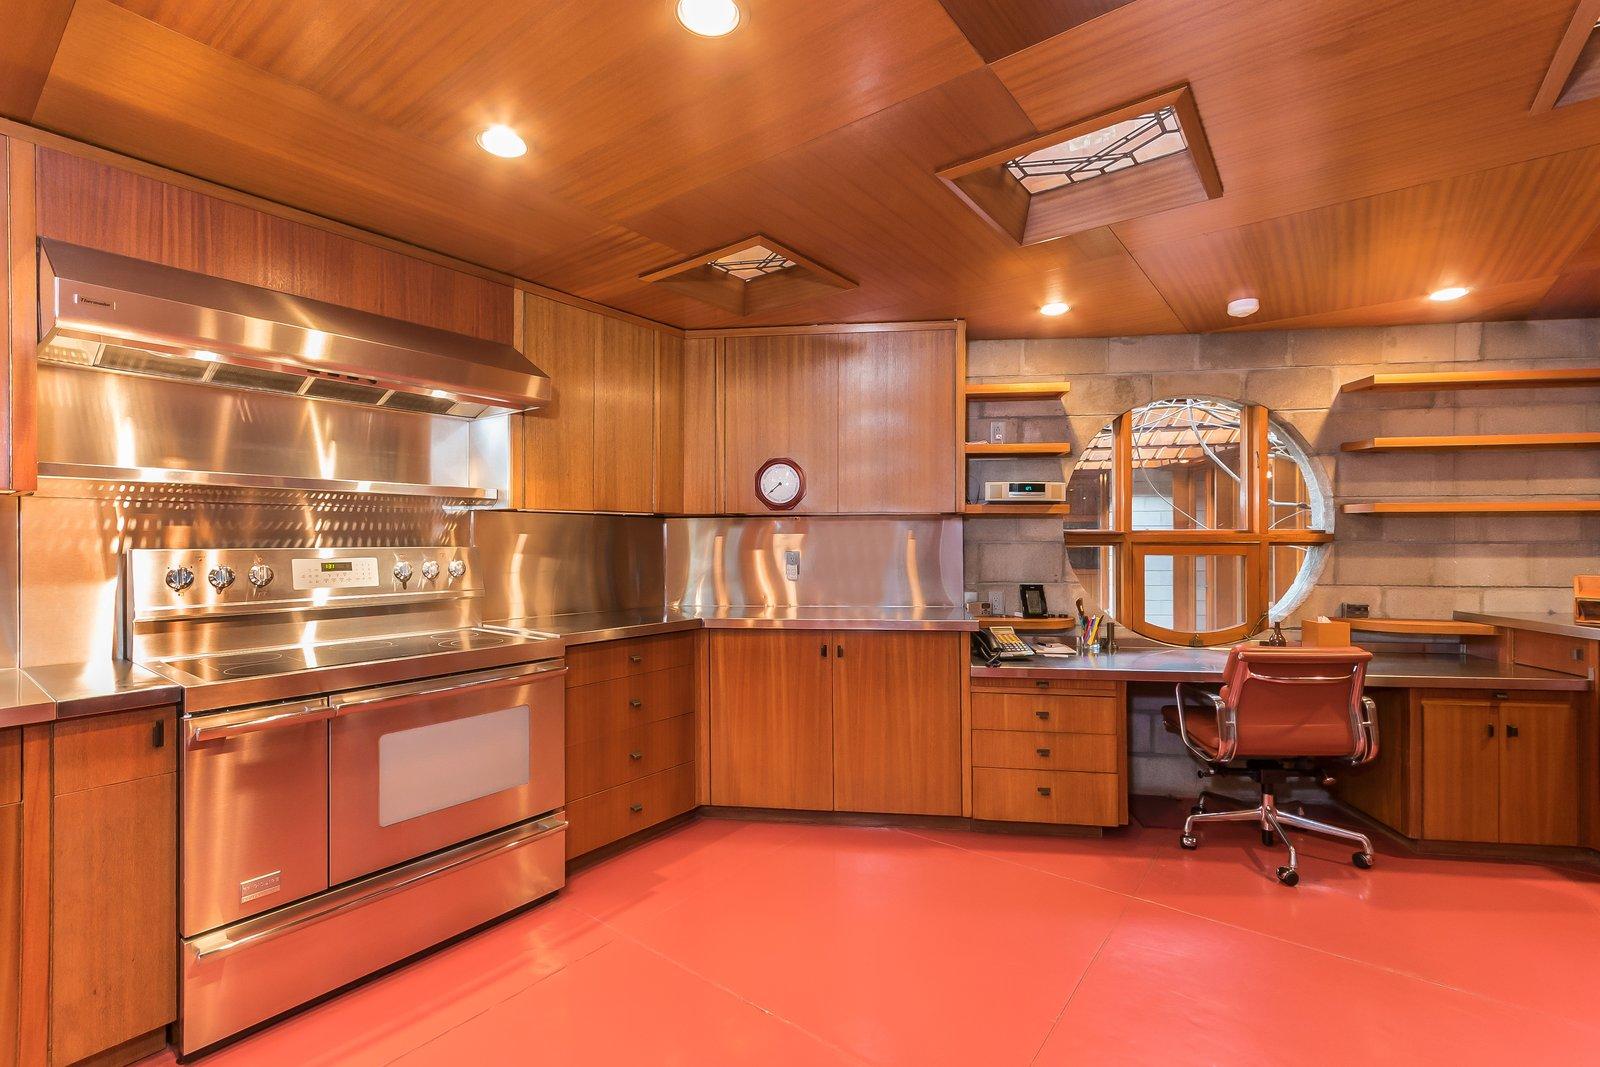 Major Kitchen Cabinets